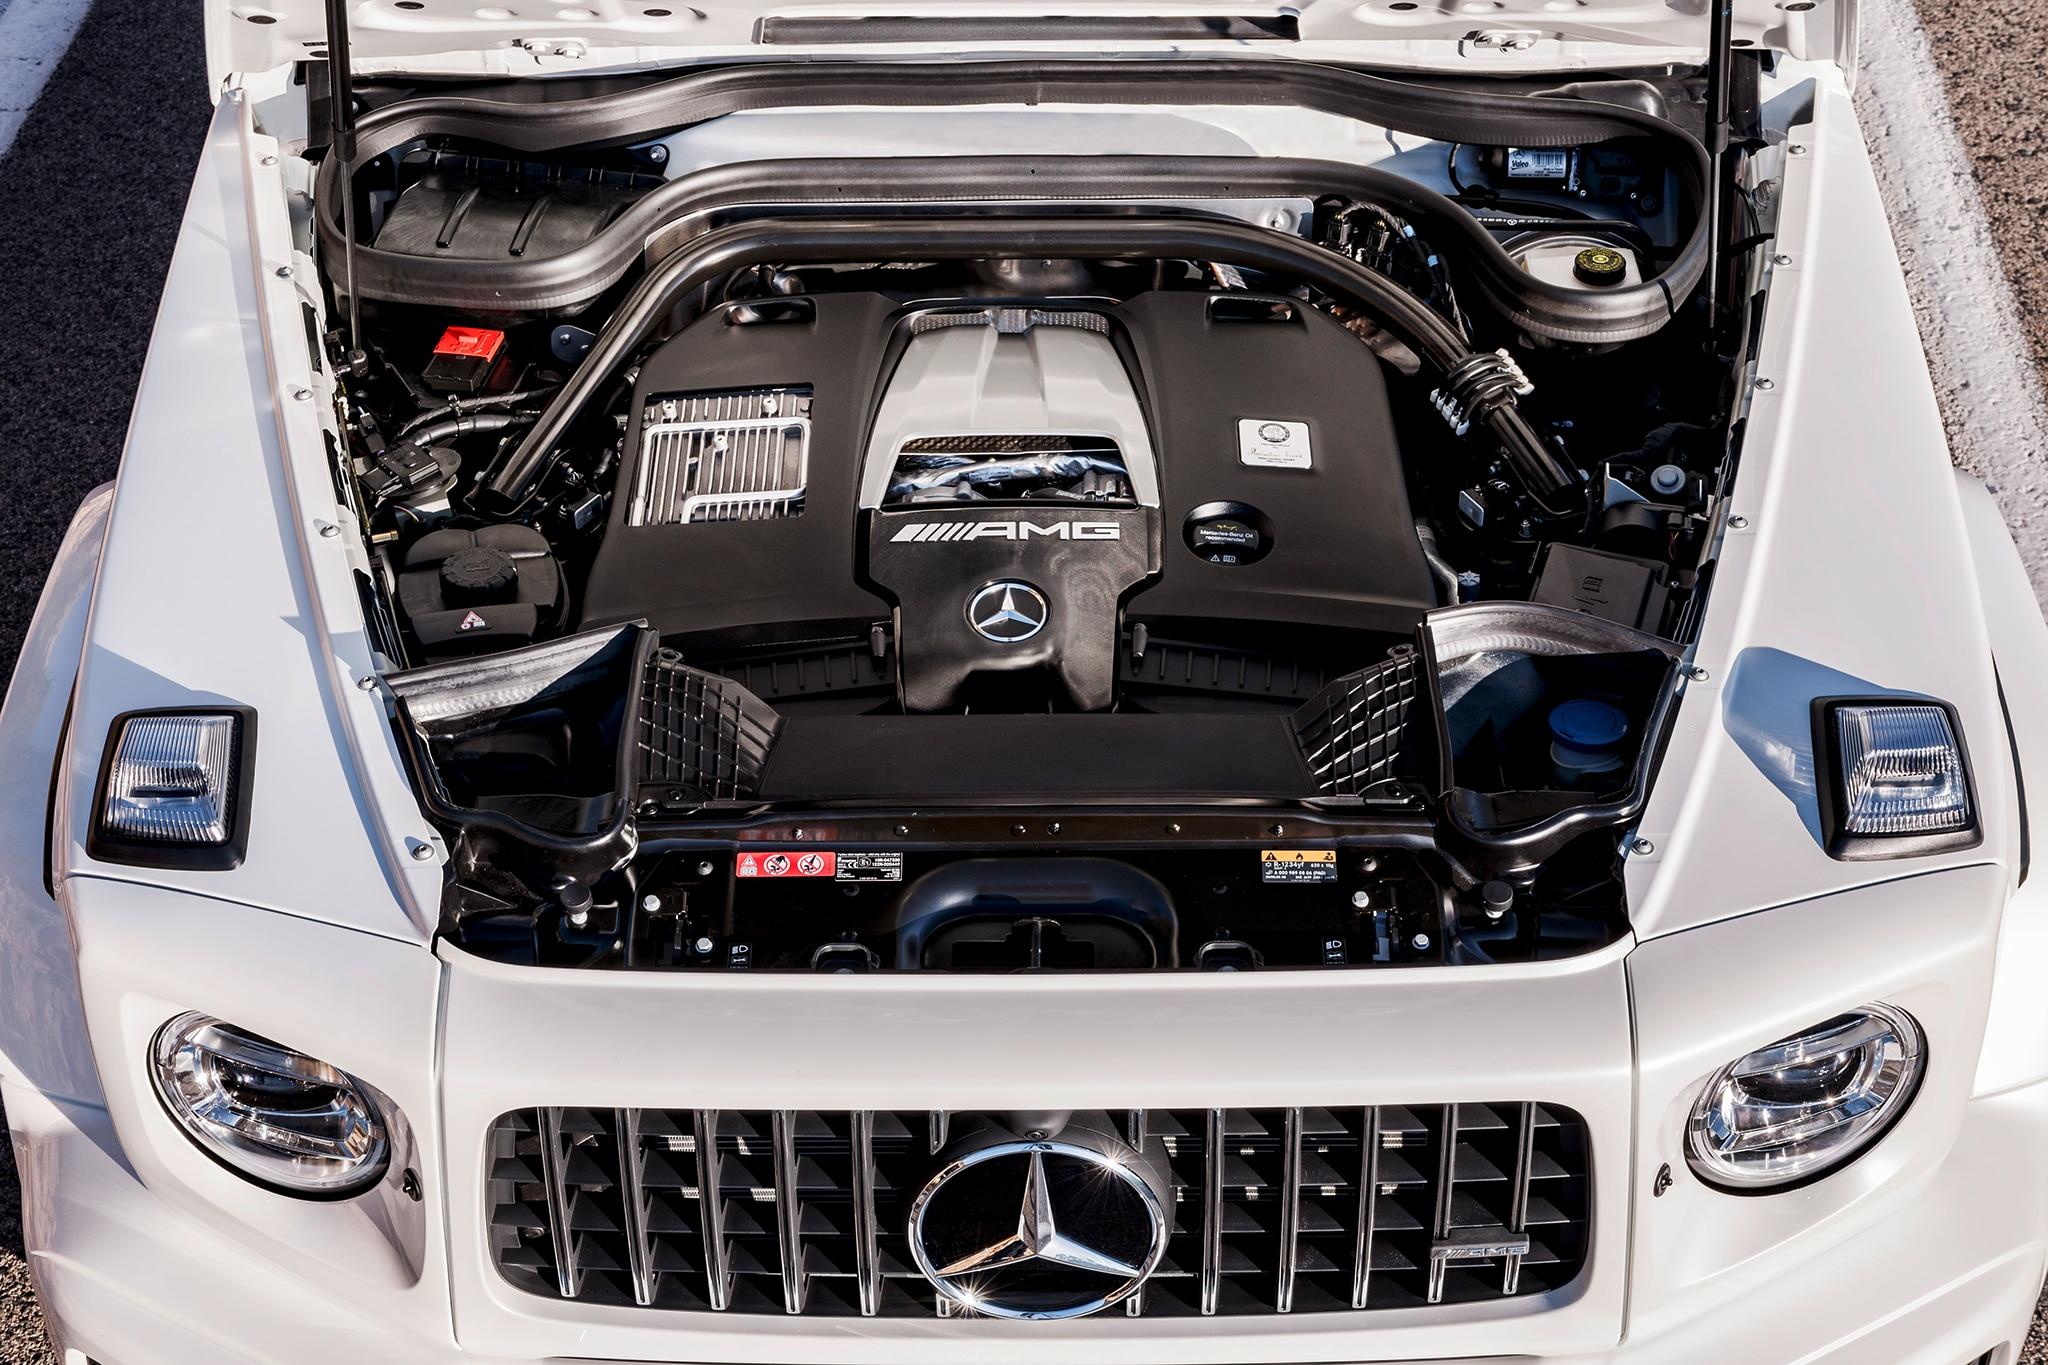 2019 Mercedes-AMG G63 Revealed Ahead of Geneva ...